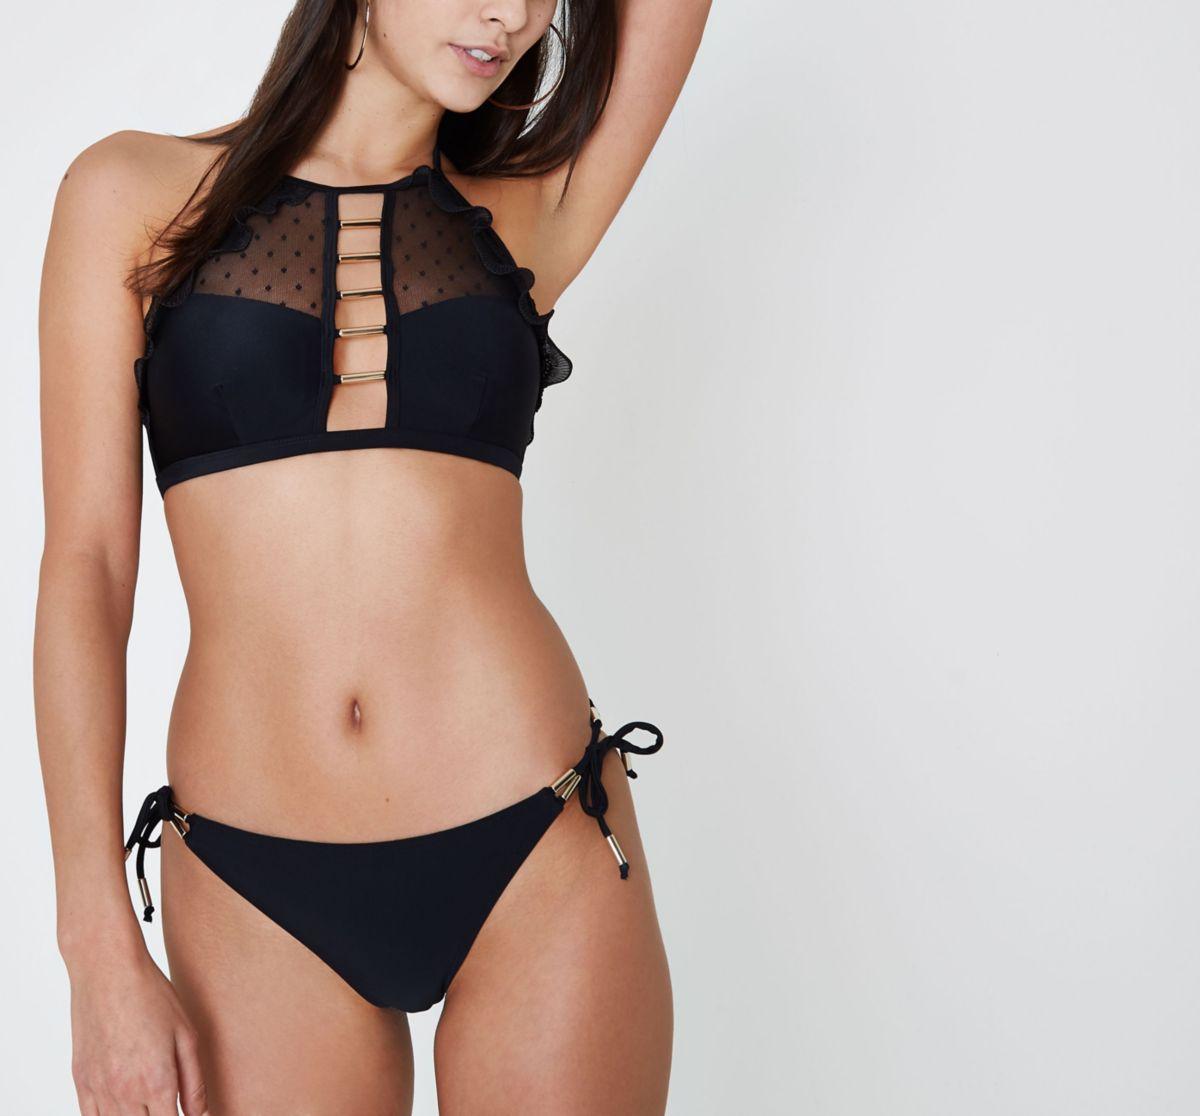 black tie side bikini bottoms photo - 1